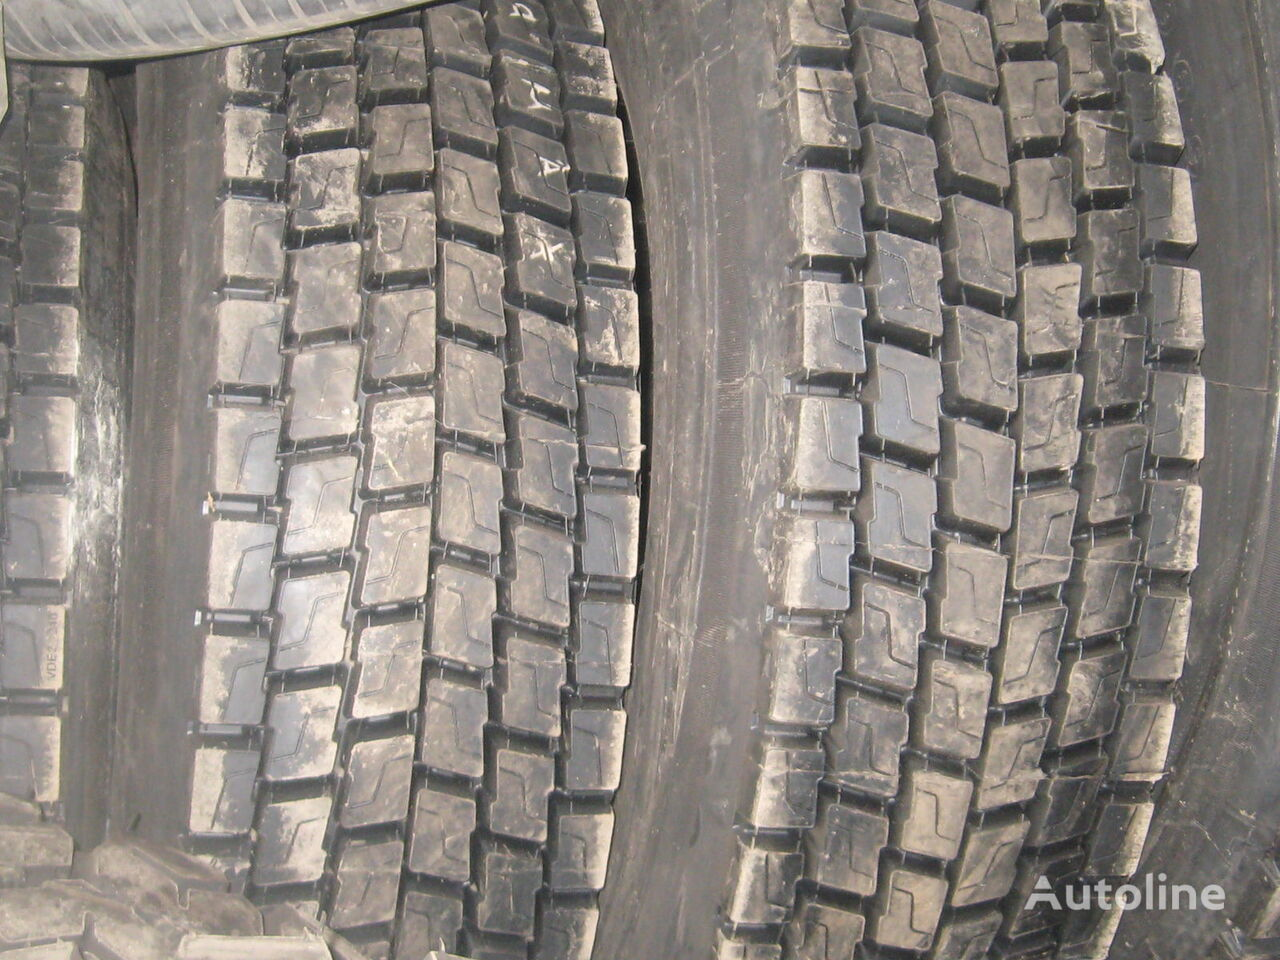 Aeolus 215/70 R 17.50 light truck tire